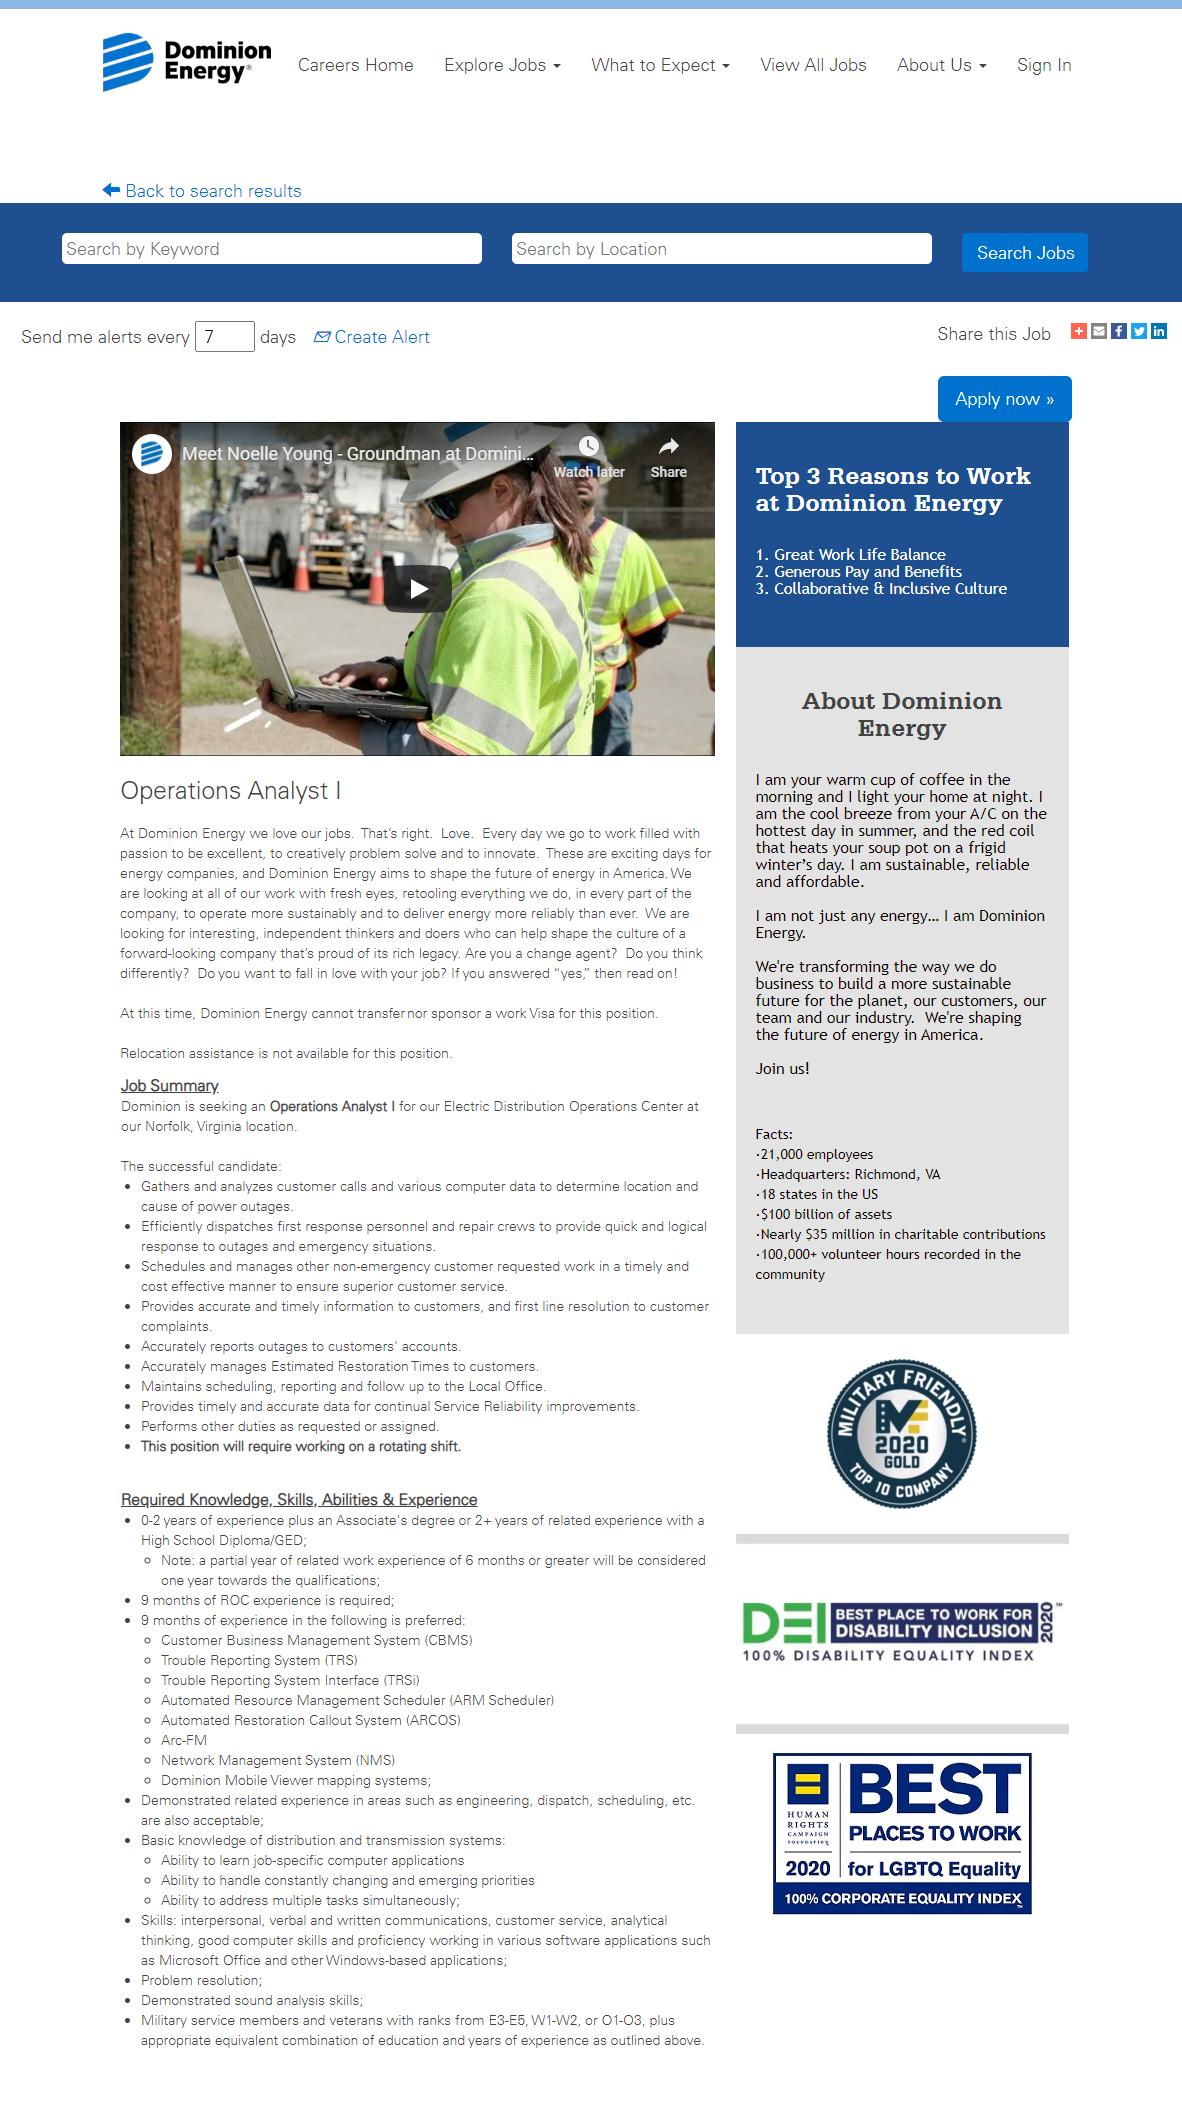 dominion energy job posting